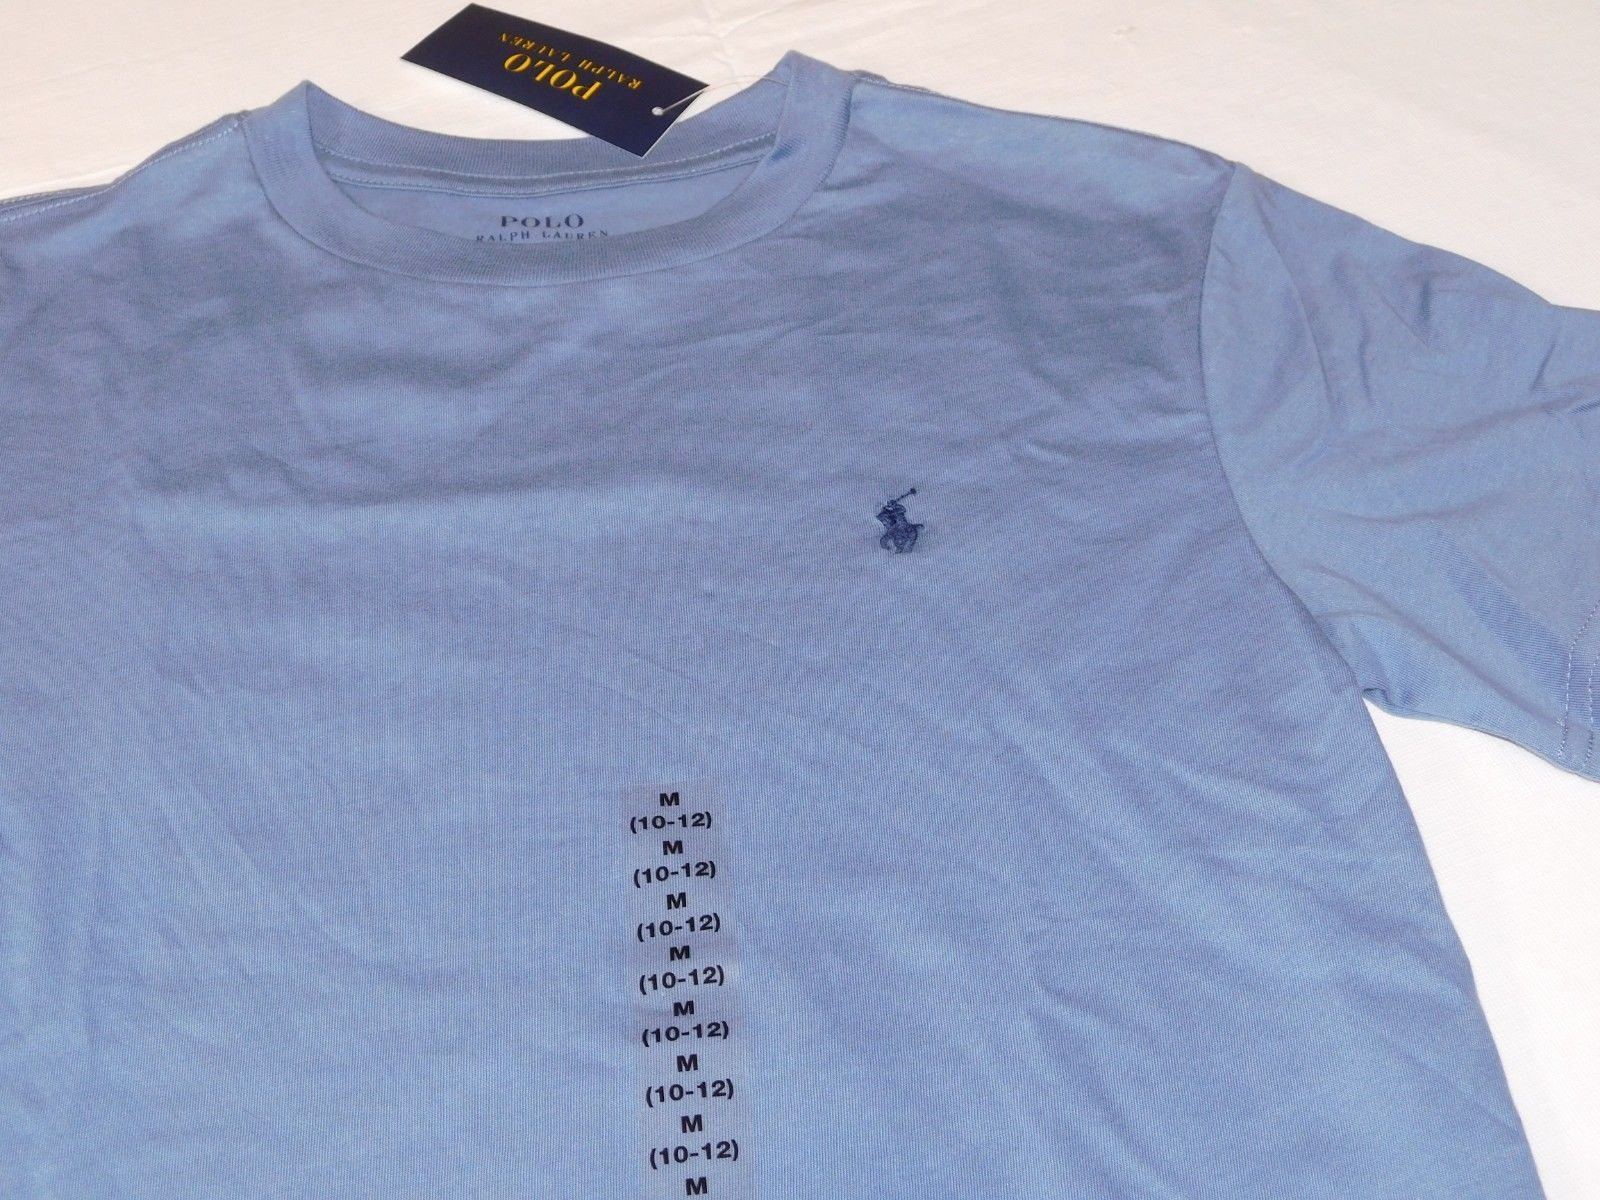 Polo Ralph Lauren Boys Youth Short Sleeve T Shirt M 10-12 Blue 638005 NWT